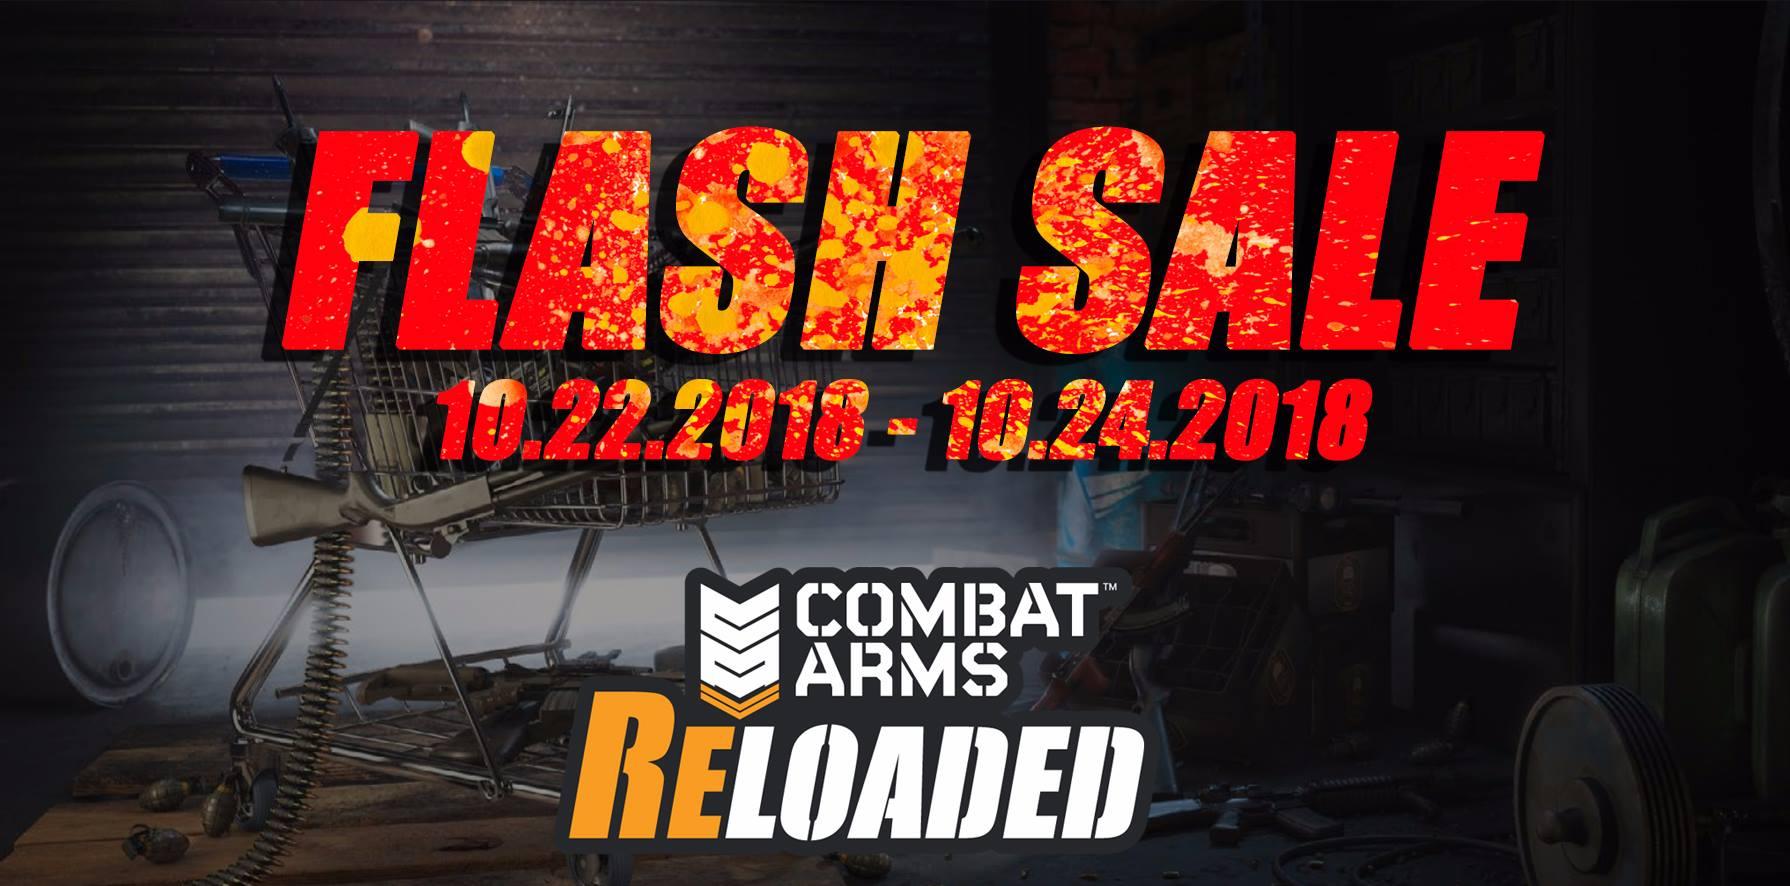 Flash sale 10.22.2018 - 10.24.2018